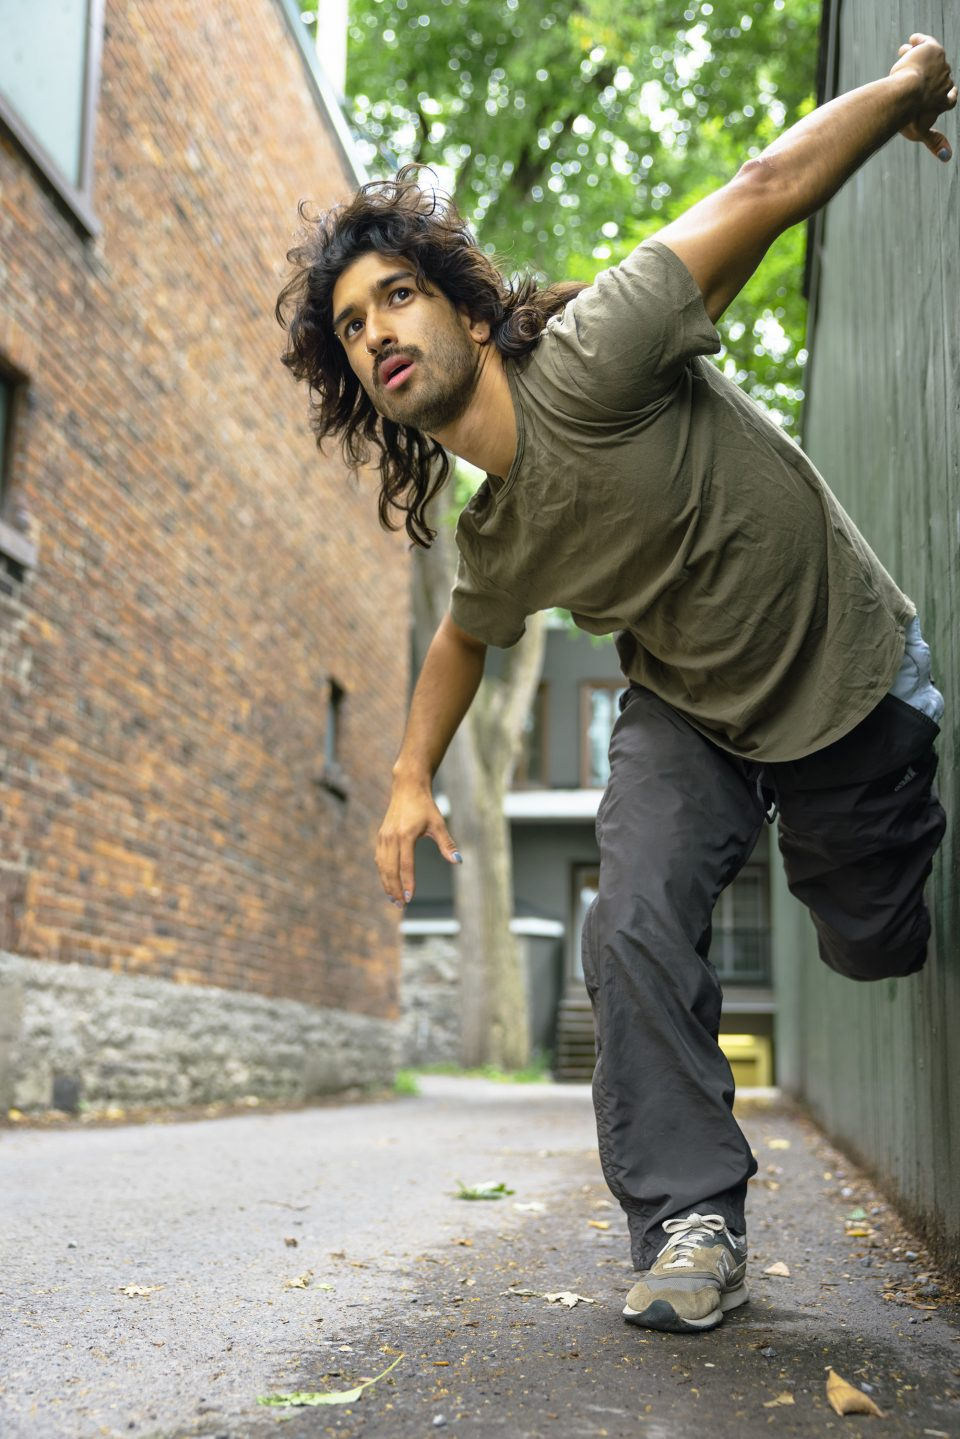 Rodrigo Alvarenga Bonilla dans Osez! en solo 2021 - Danse K par K / Crédit photo : Stéphane Bourgeois